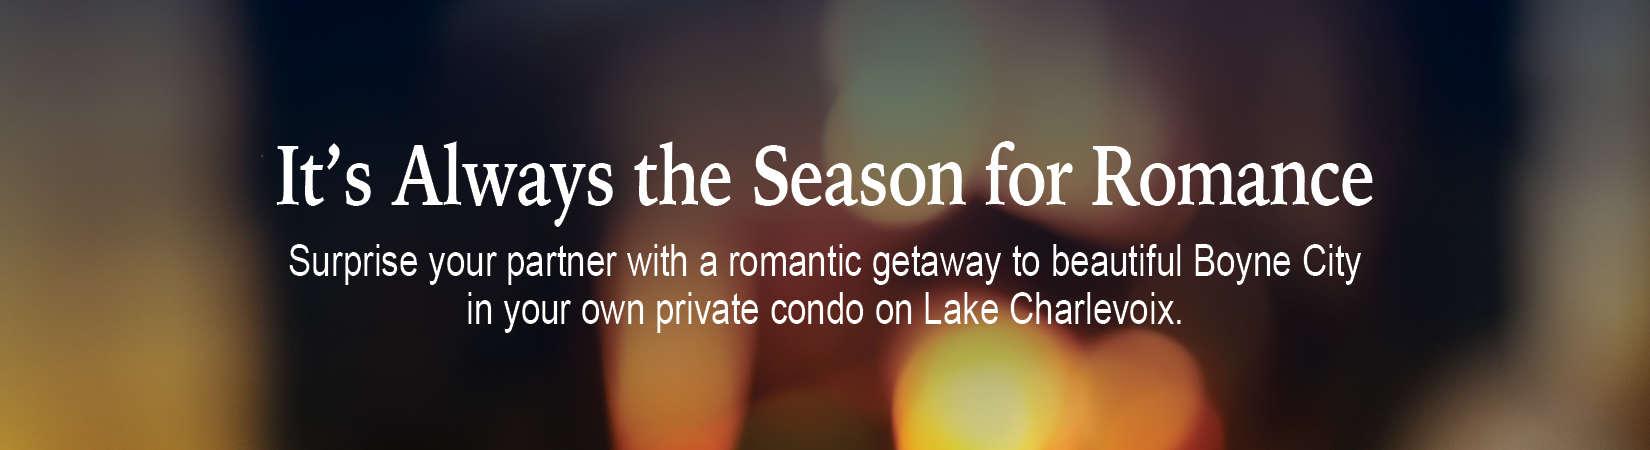 romantic getaway banner